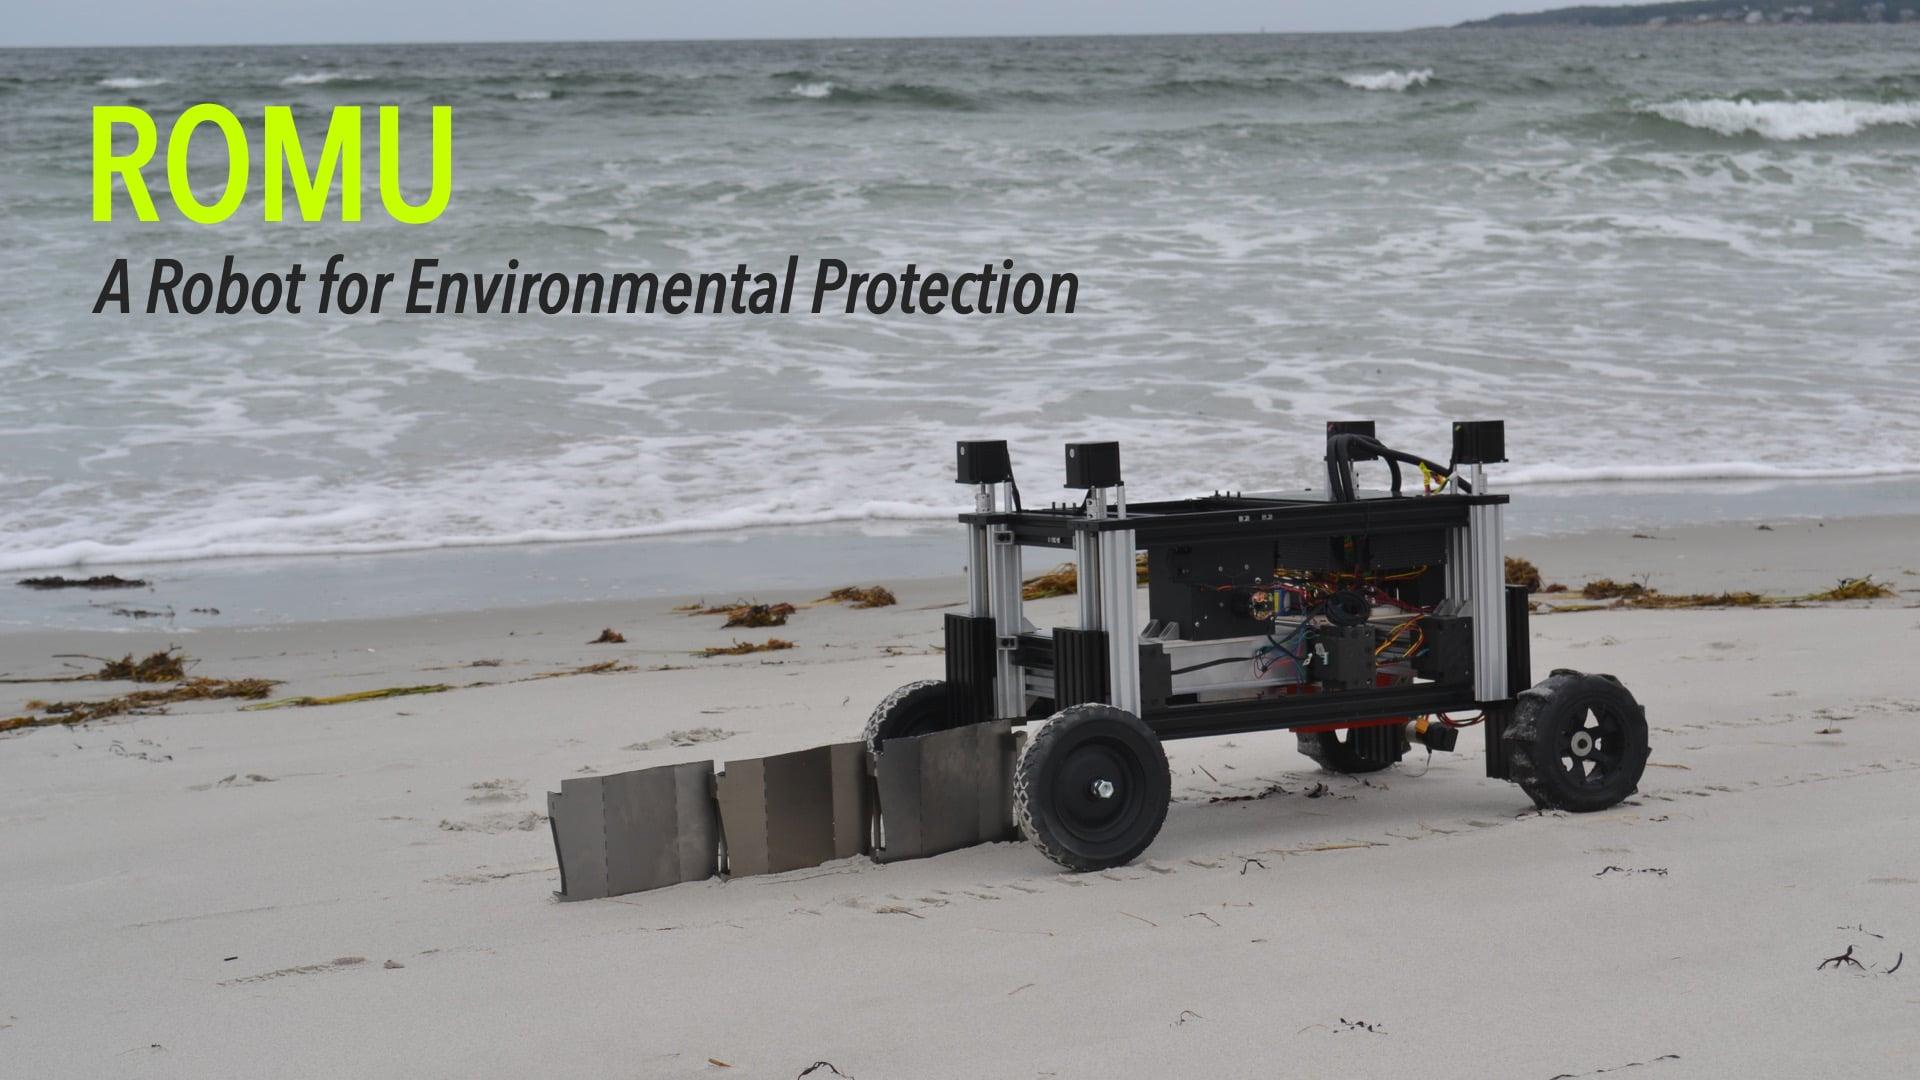 Romu: A Robot for Environmental Protection